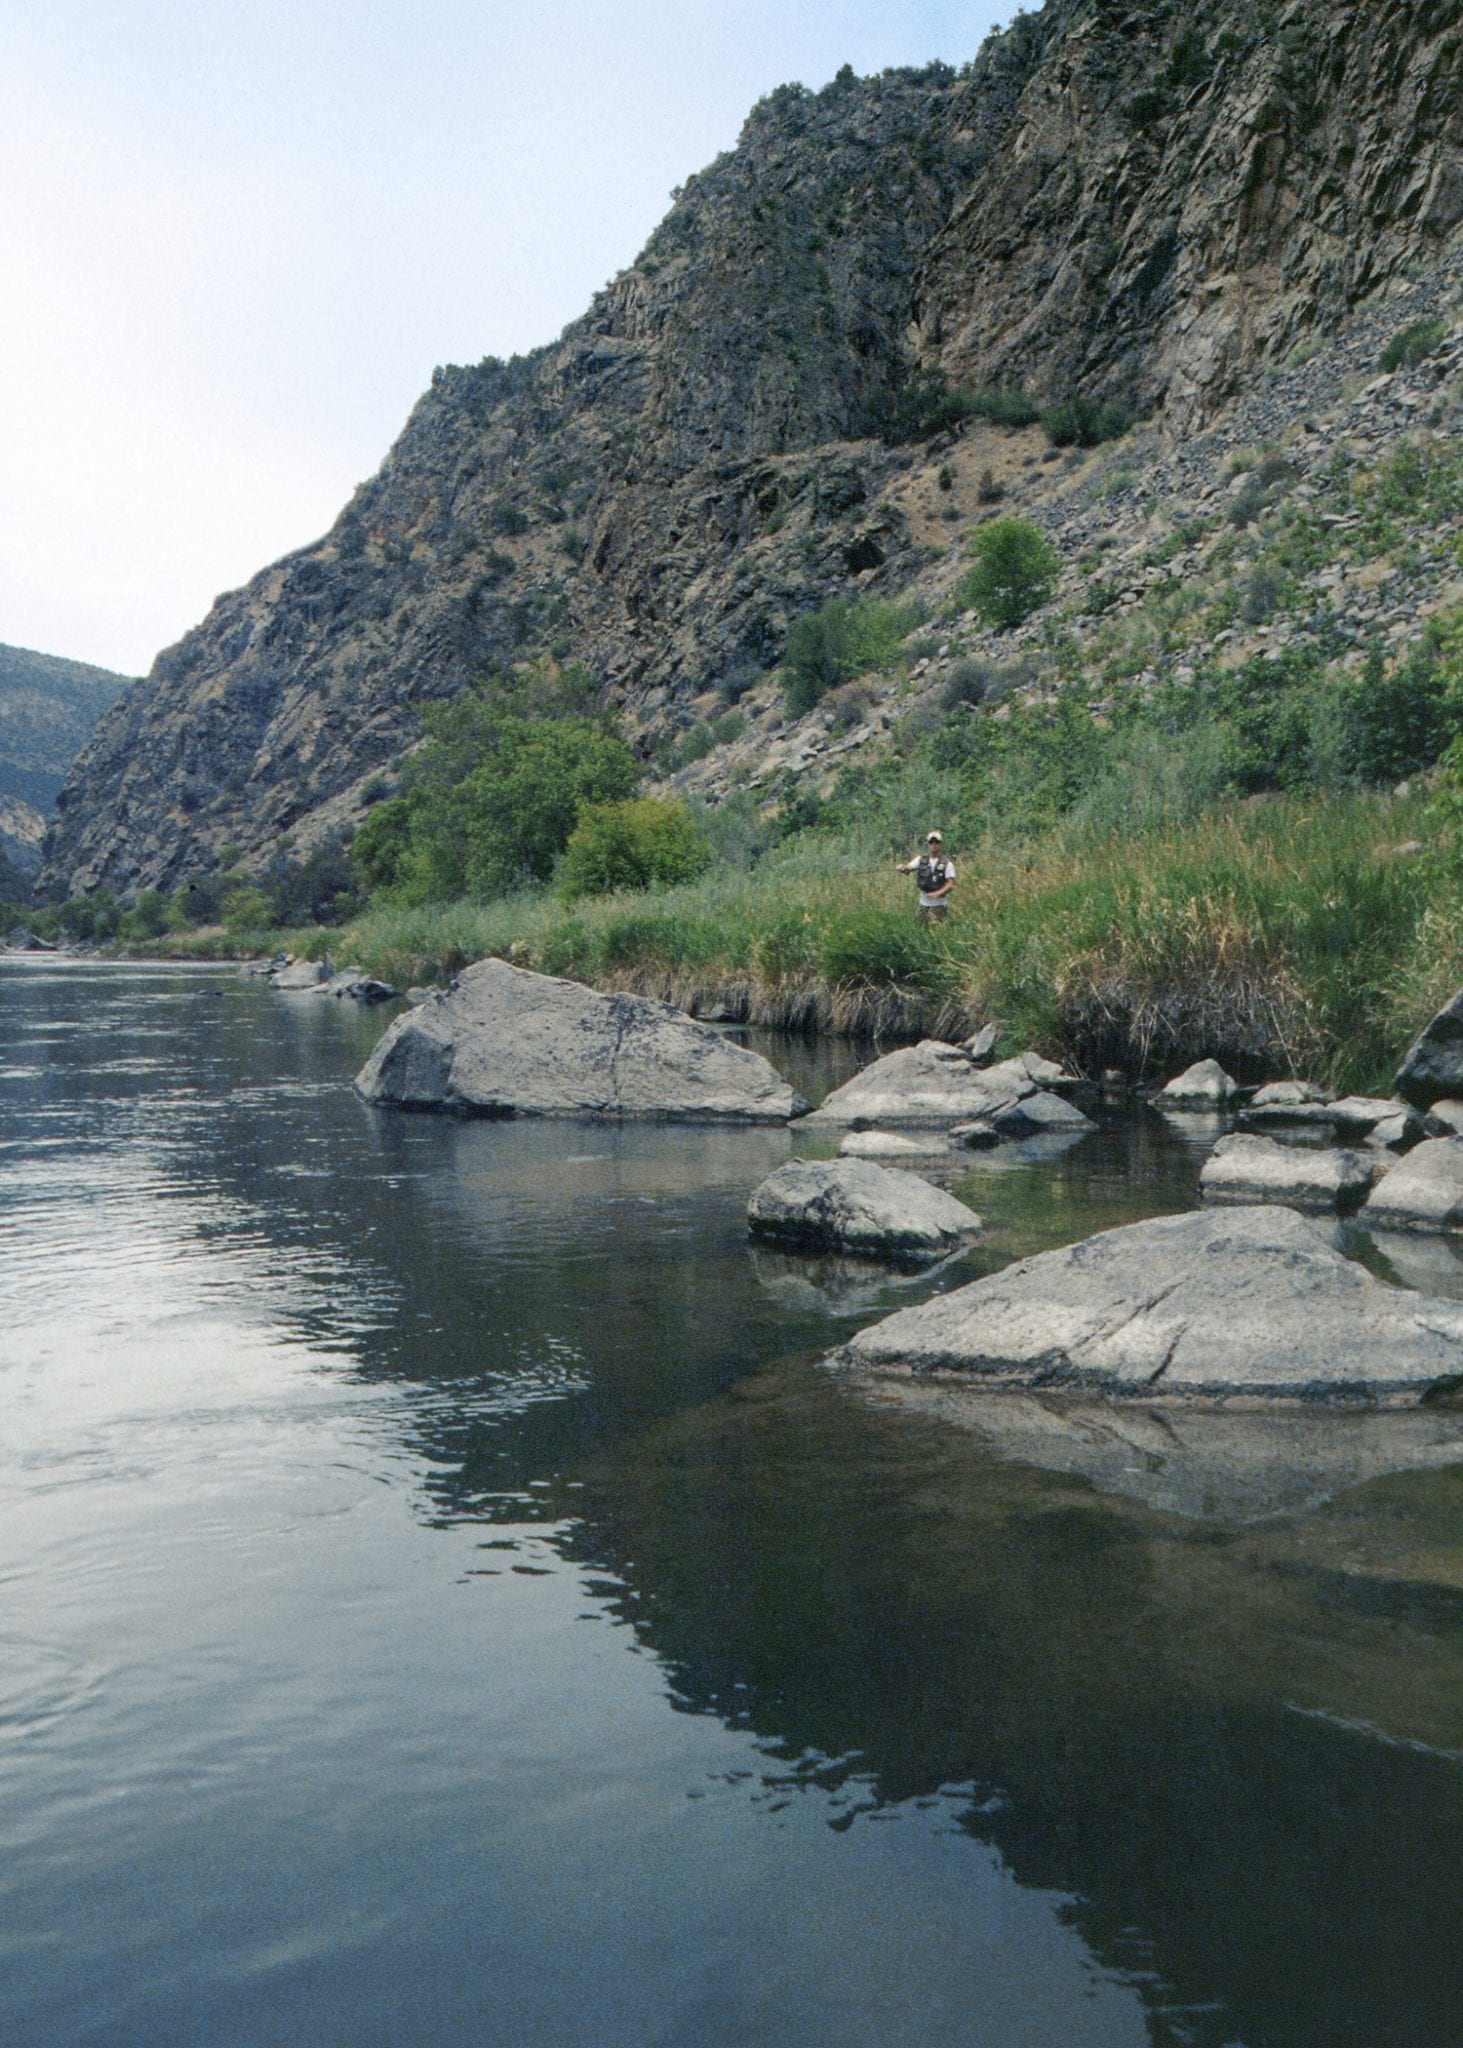 Trout Fishing Gunnison River in Gunnison Gorge NCA Colorado